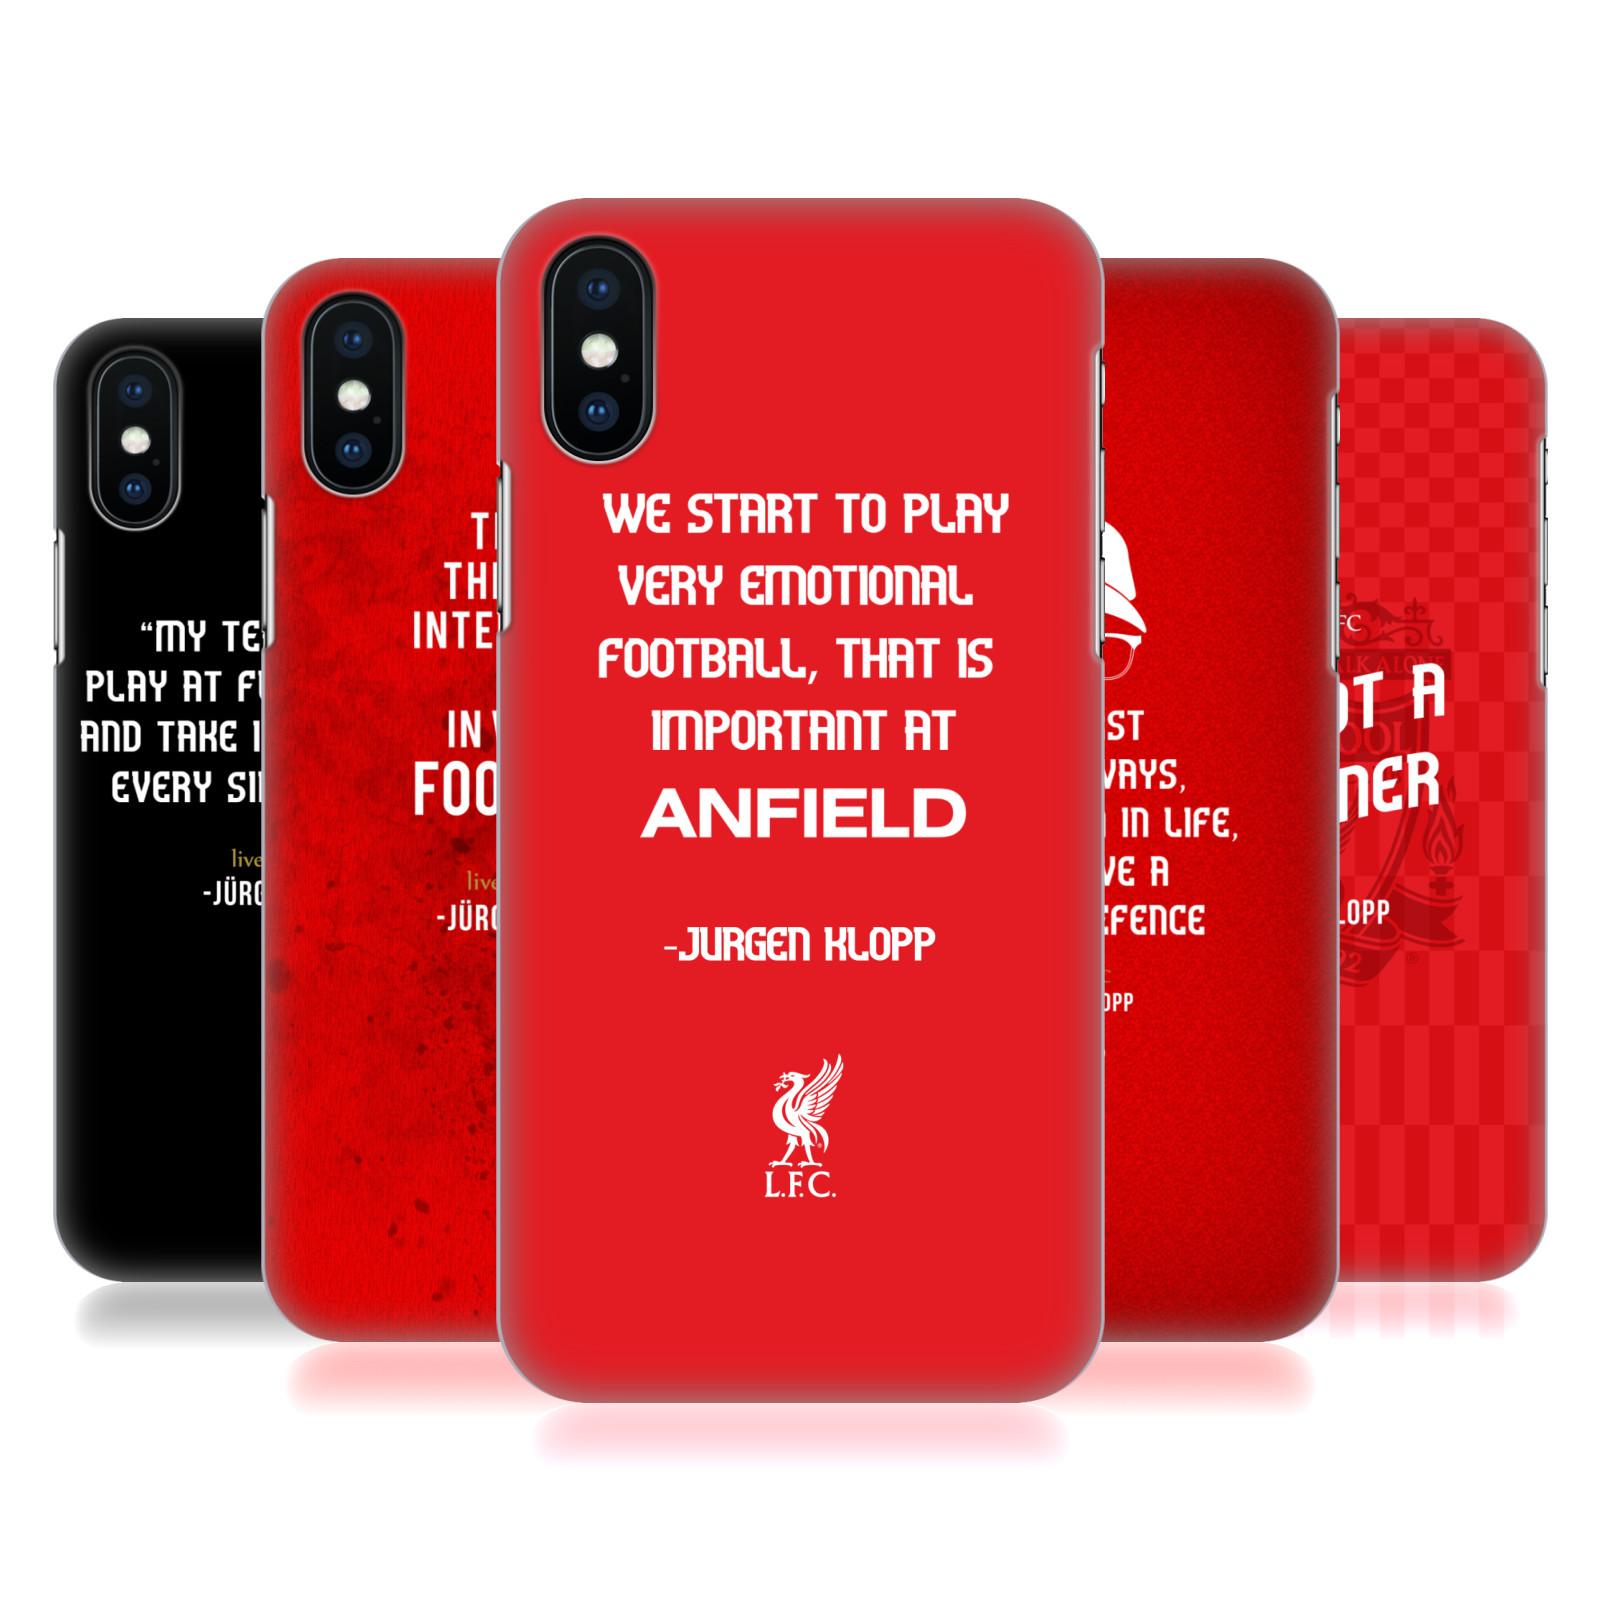 Liverpool Football Club Klopp Quotes